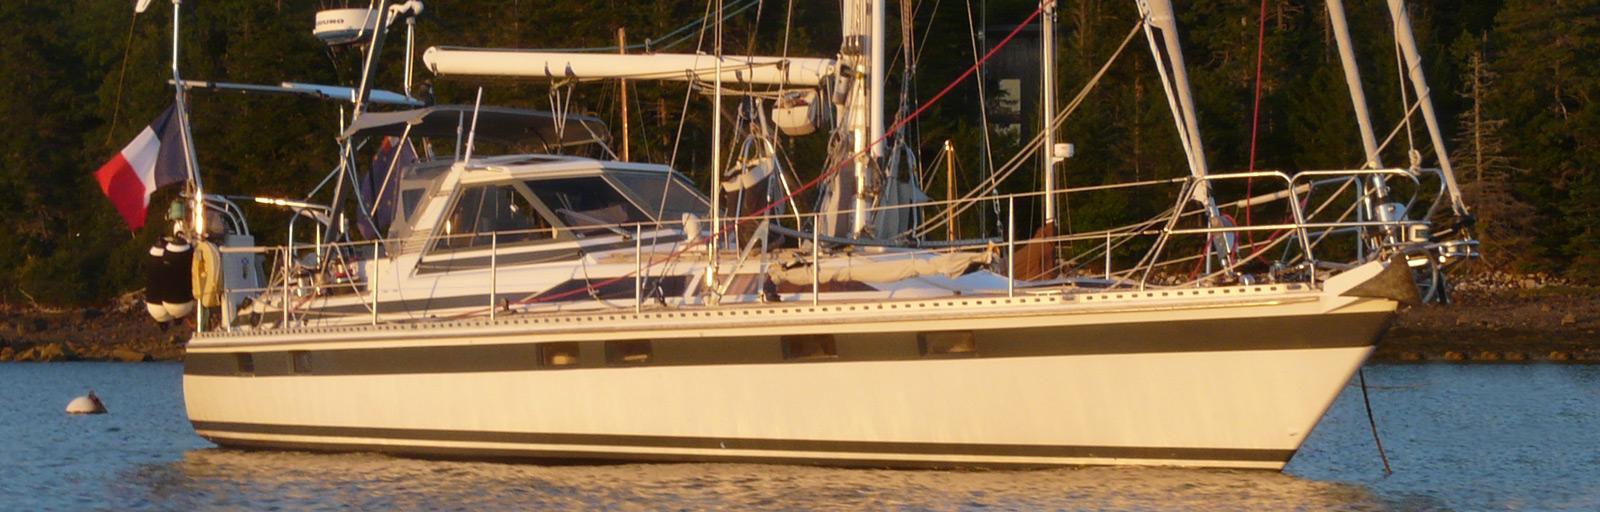 Trintella 44 Alu - AYC Yachtbroker